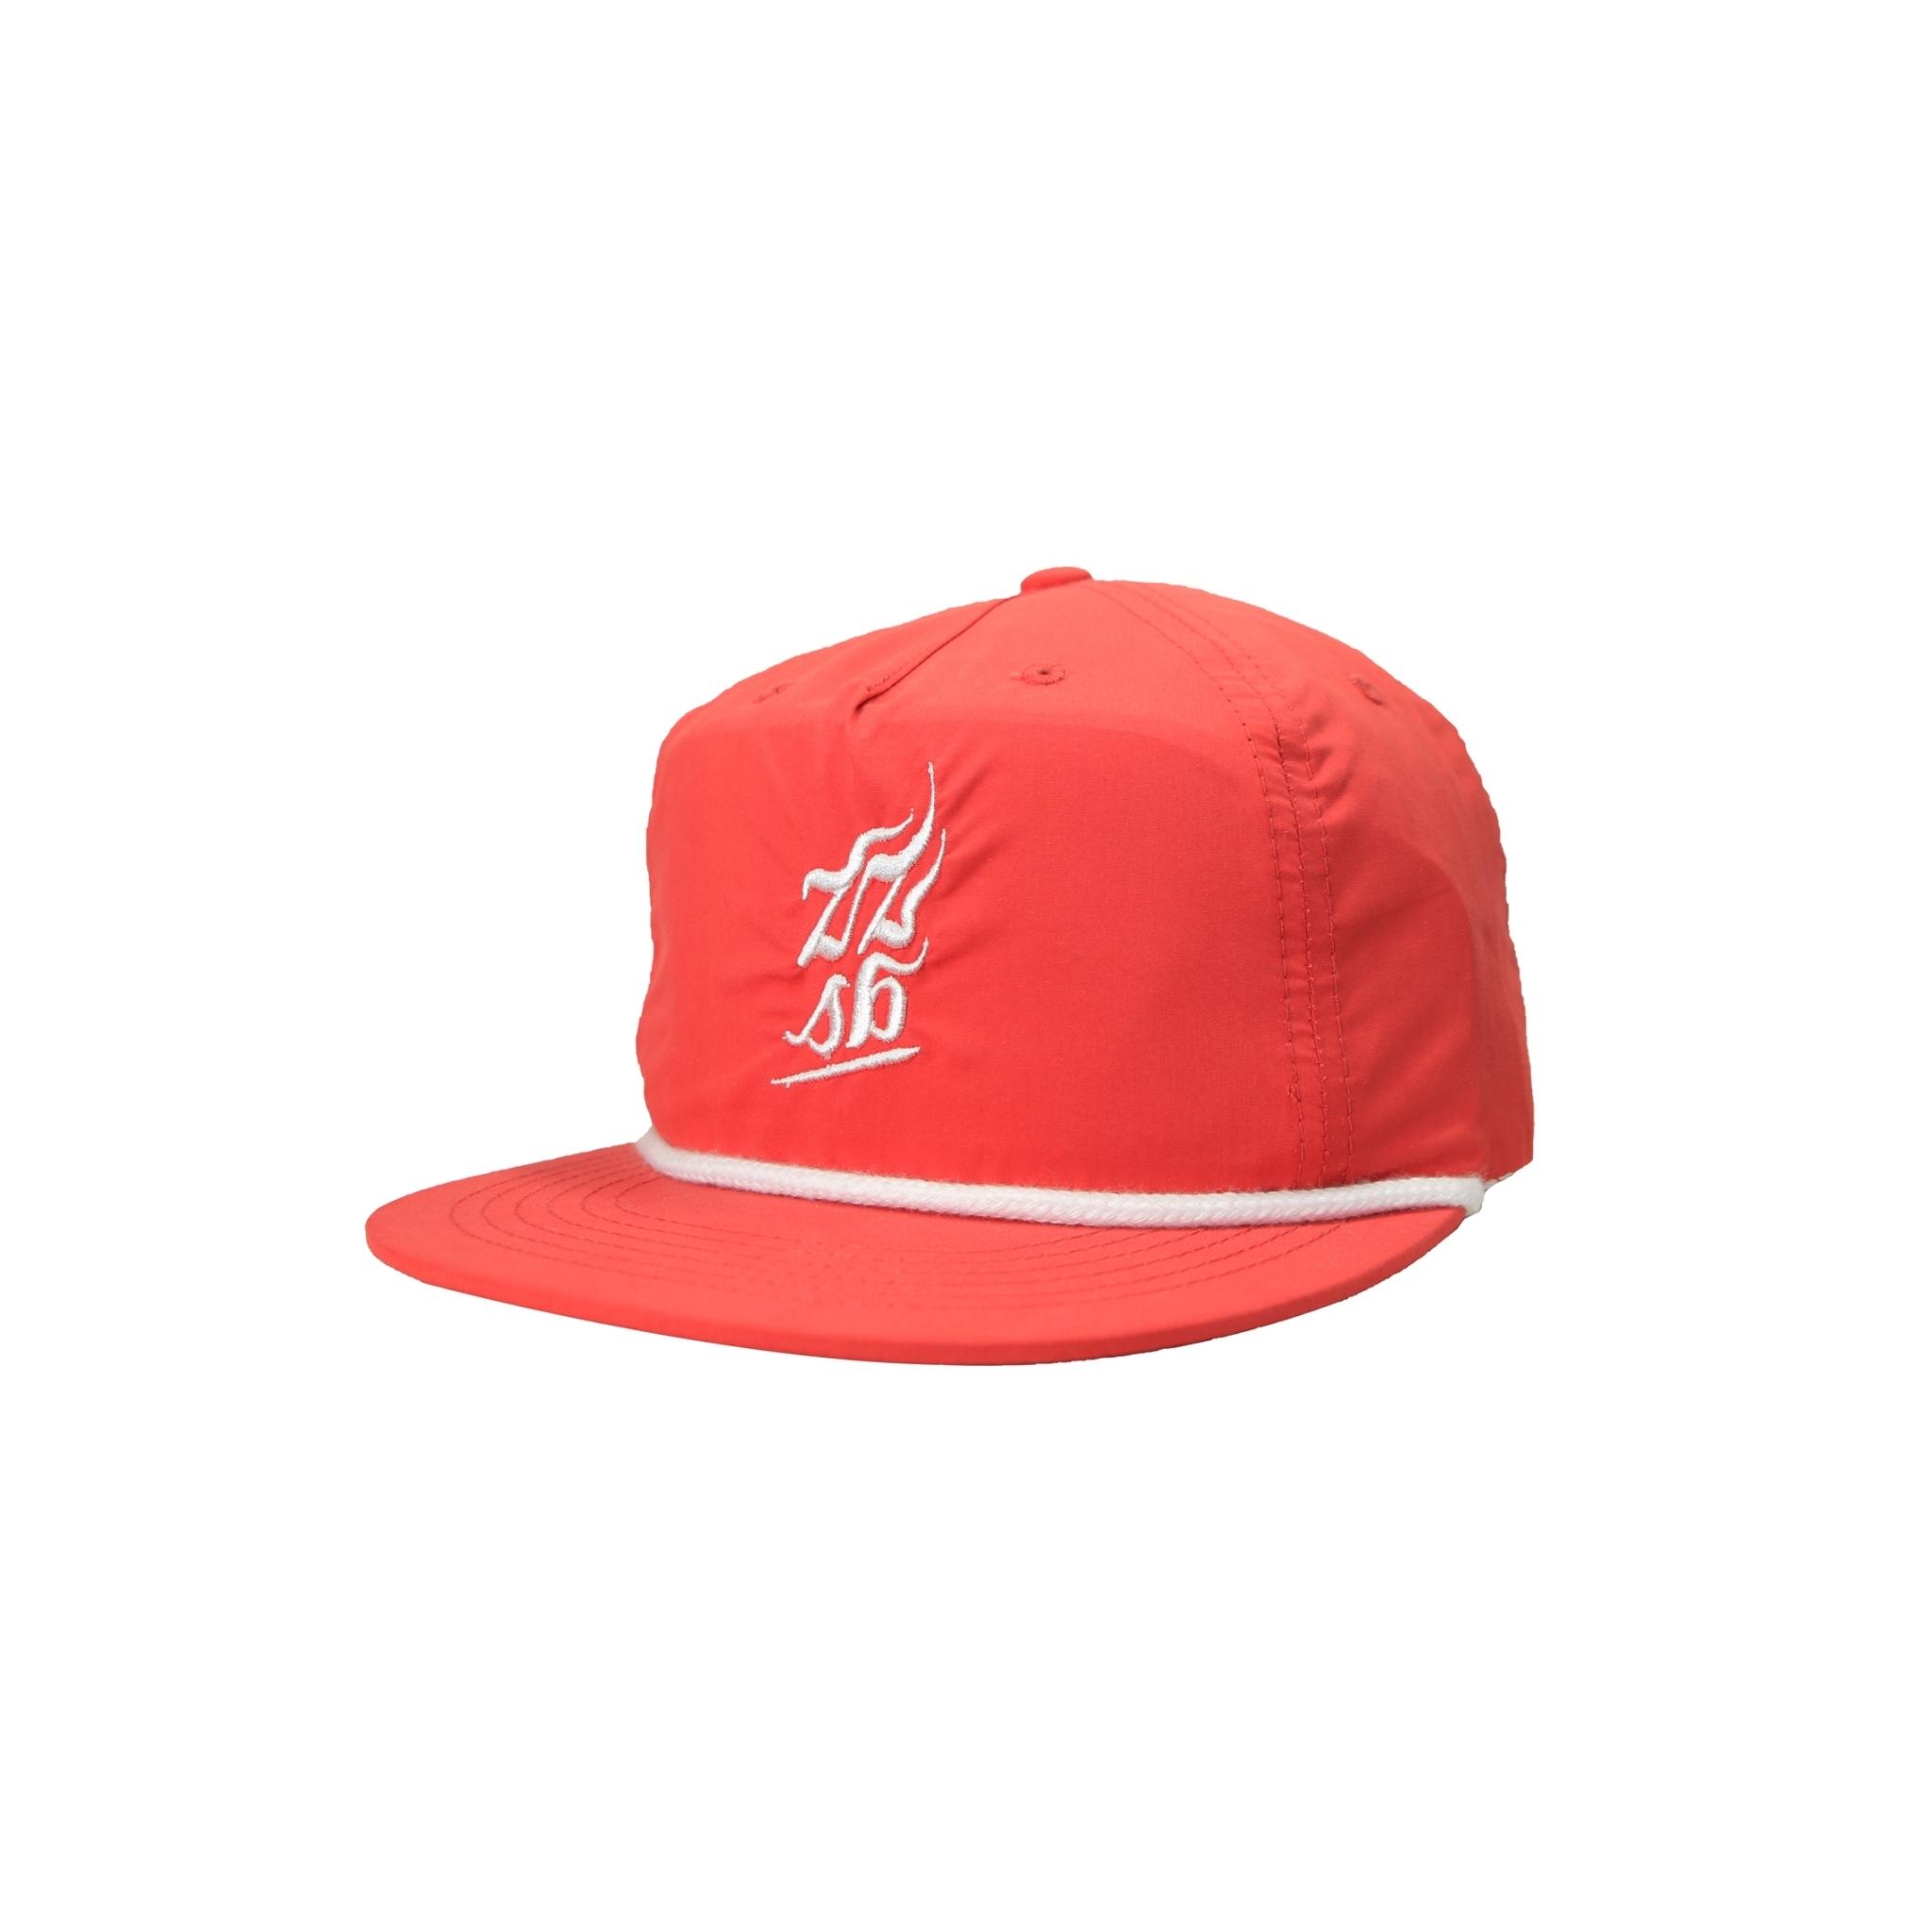 ZZSB CALI 5 PANEL NYLON CAP [RED]